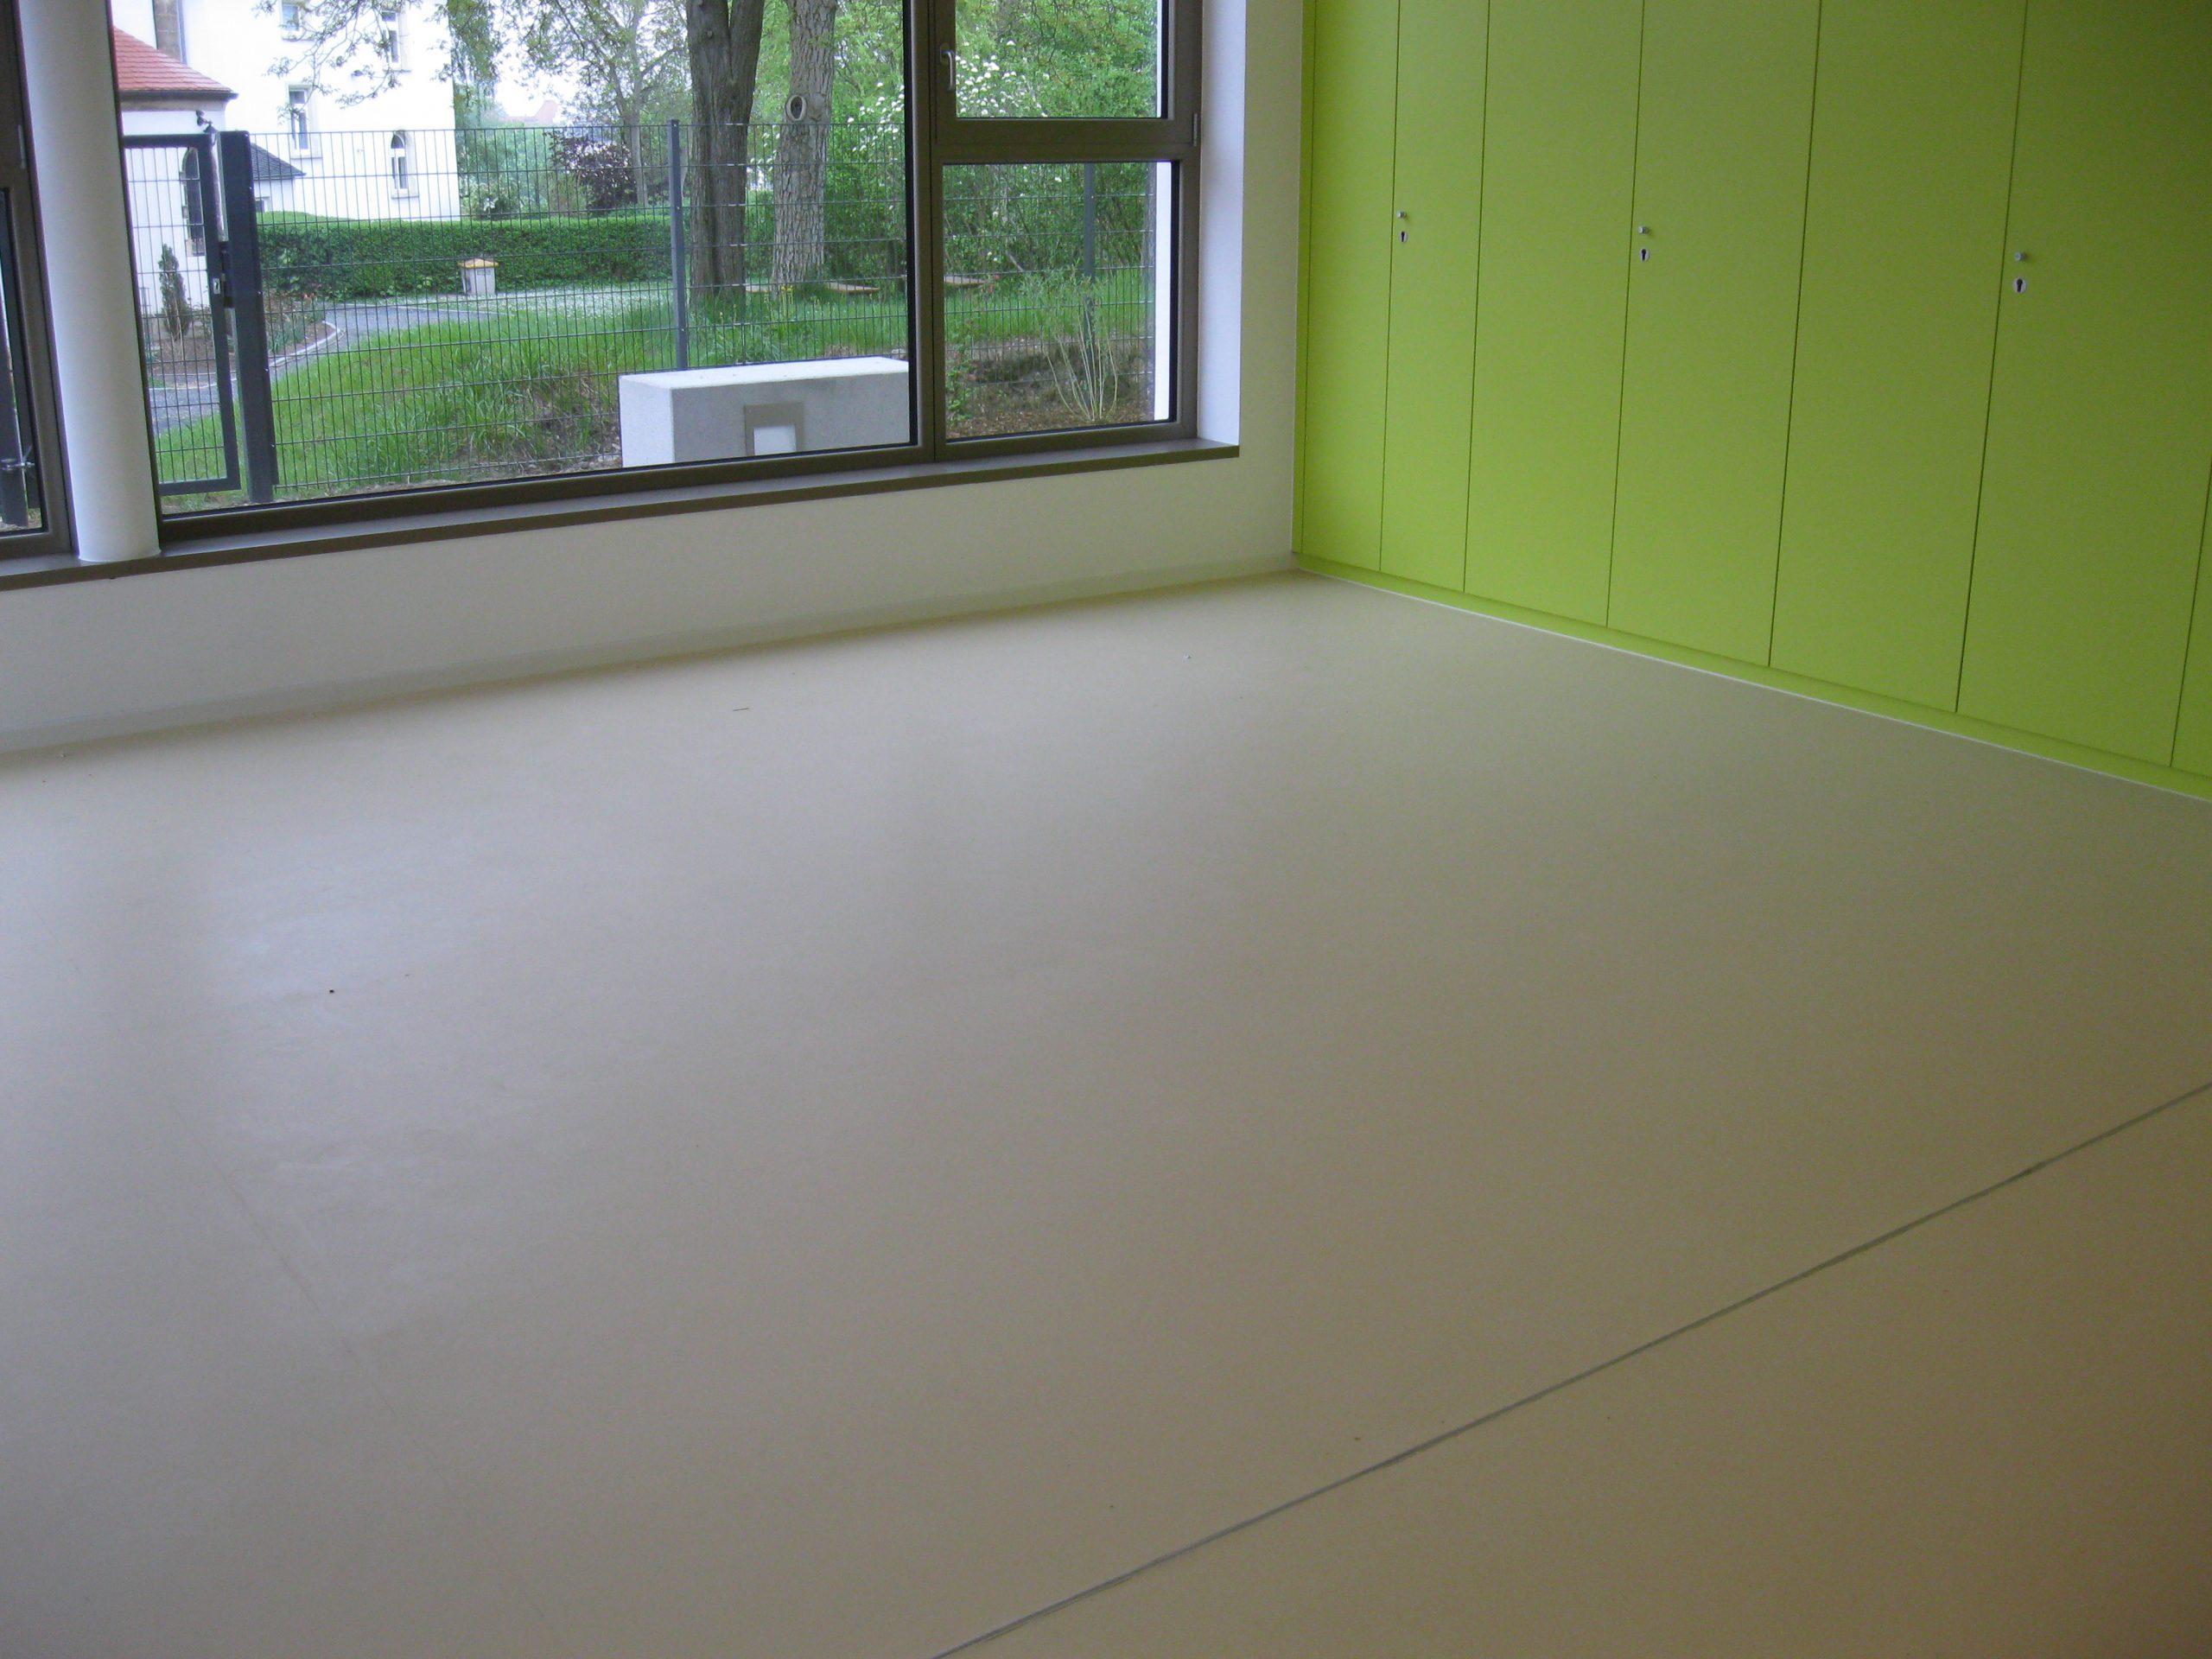 elastische Beläge (PVC, Kautschuk, Linoleum, Kork)